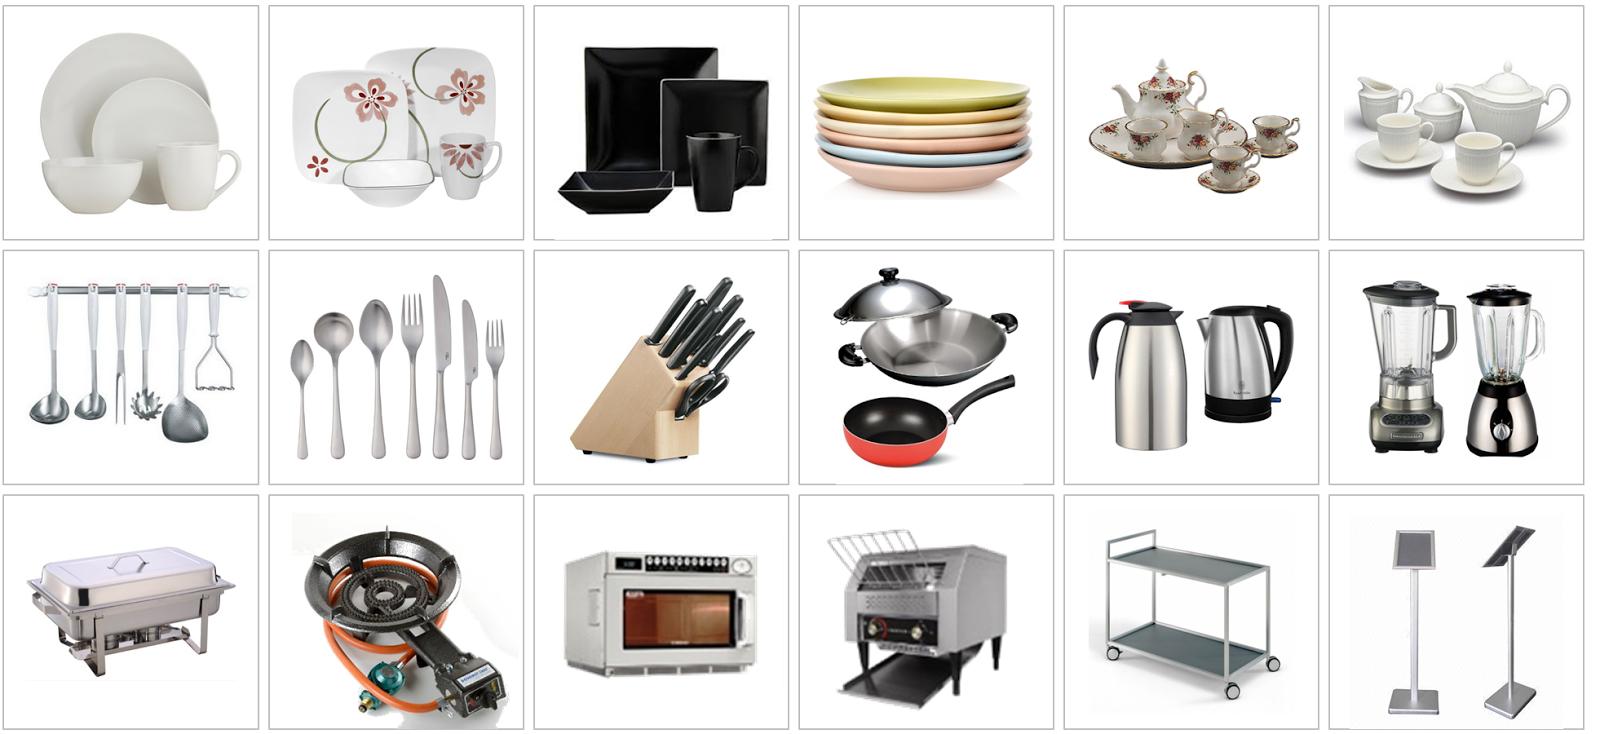 Gambar Peralatan Dapur 2